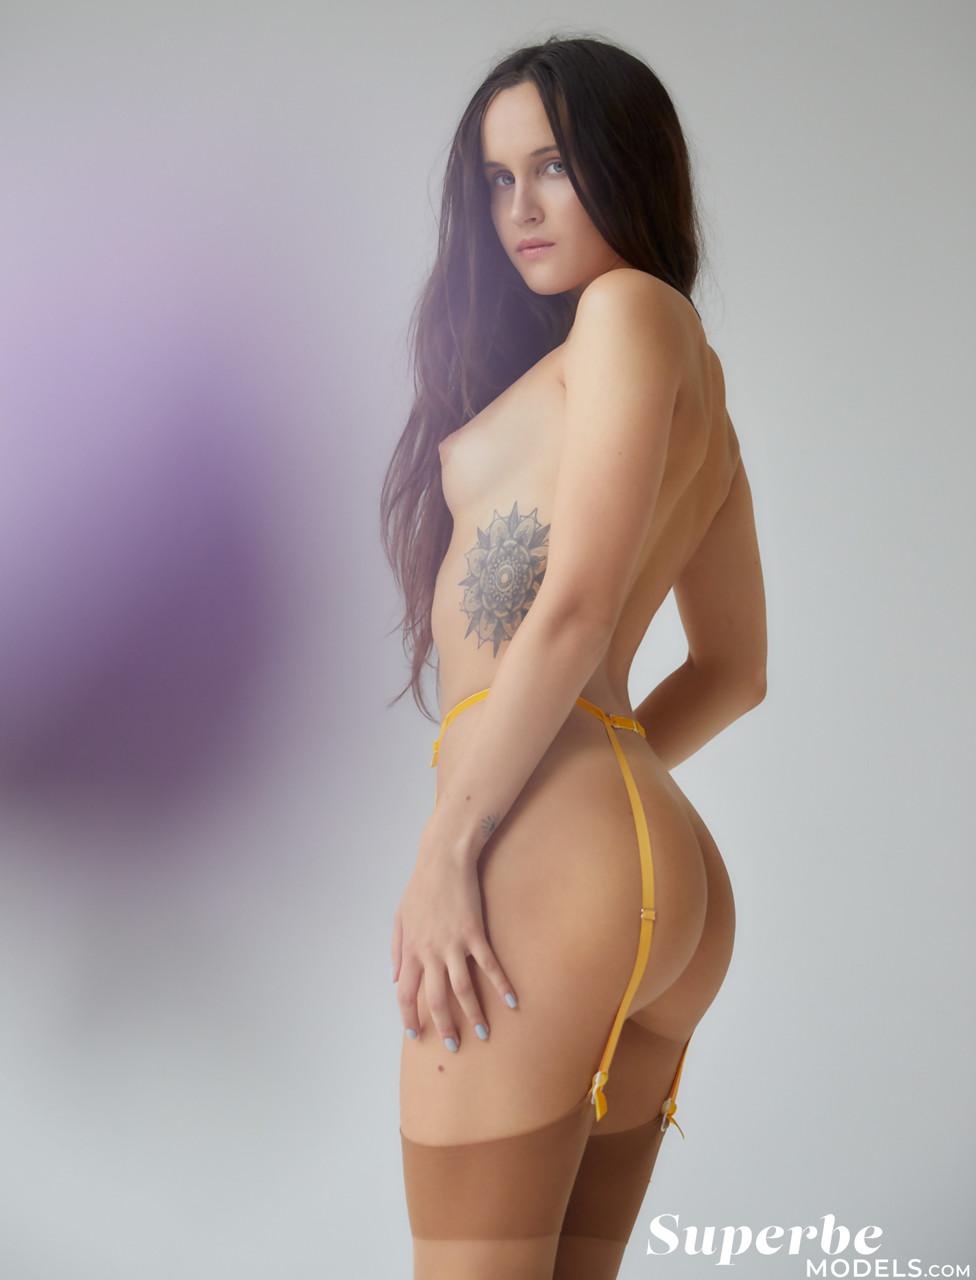 Superbe Models Brianna Wolf